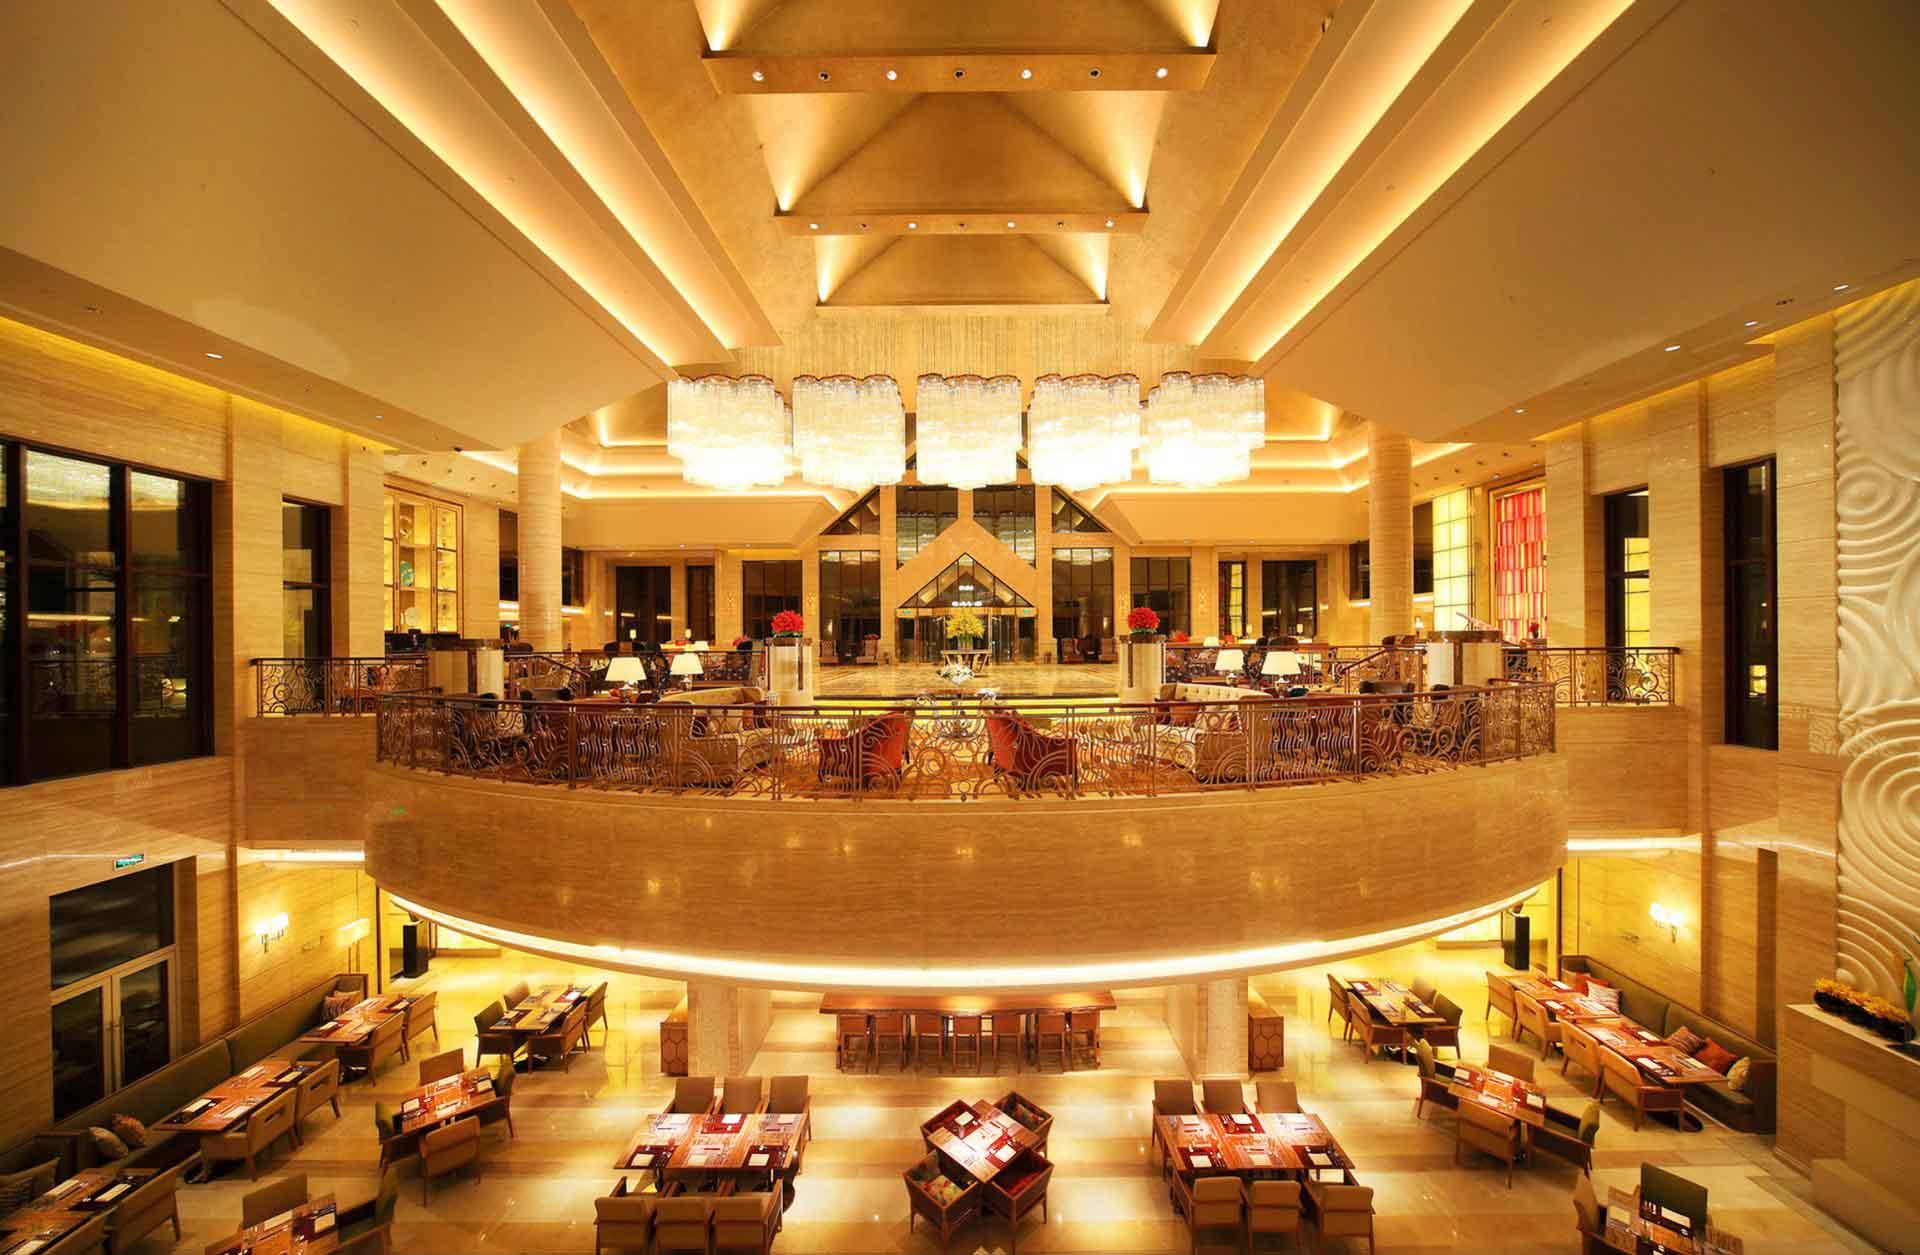 SOCIALIGHT HILTON QIANDAO HU A3 Lobby3